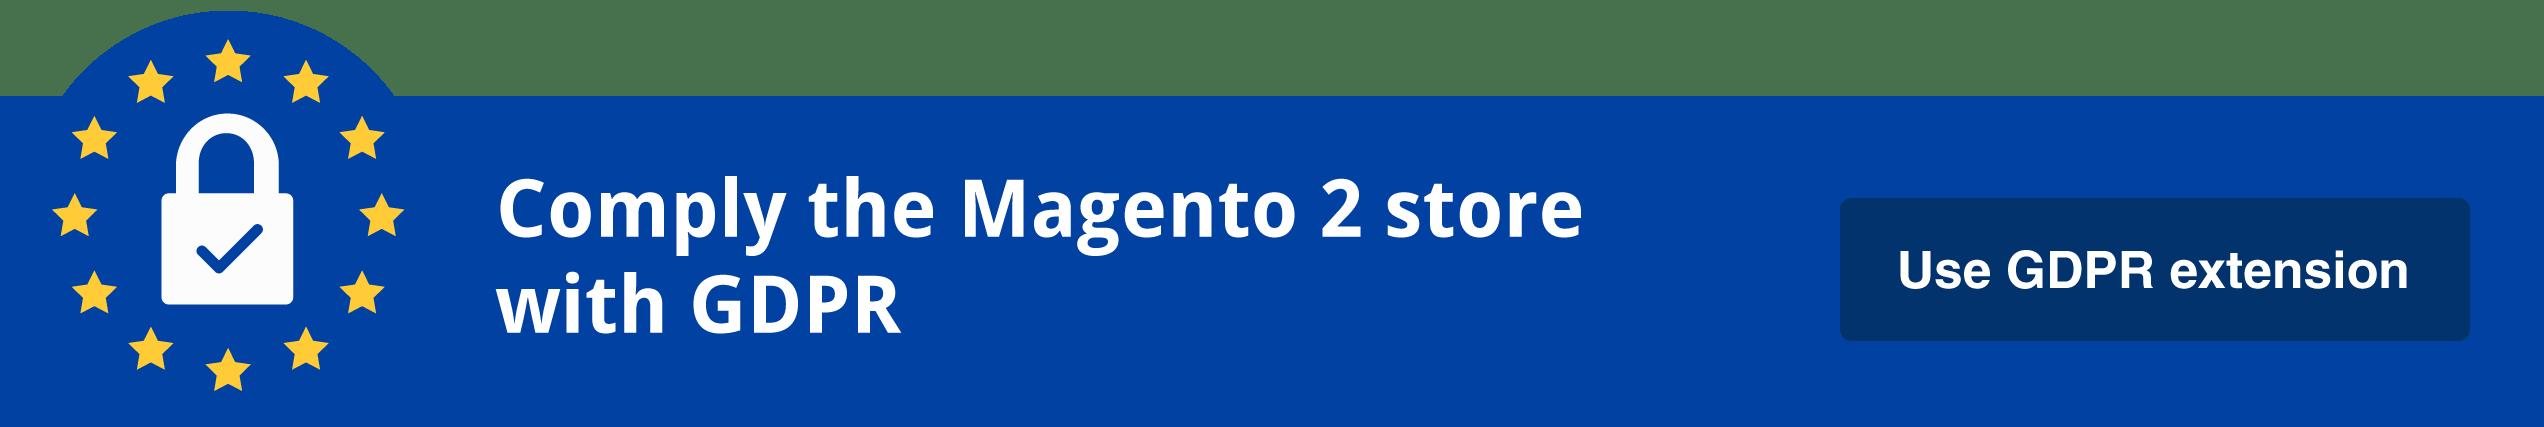 M2 GDPR - Fastest - Multipurpose Responsive Magento 2 and 1 Fashion Theme